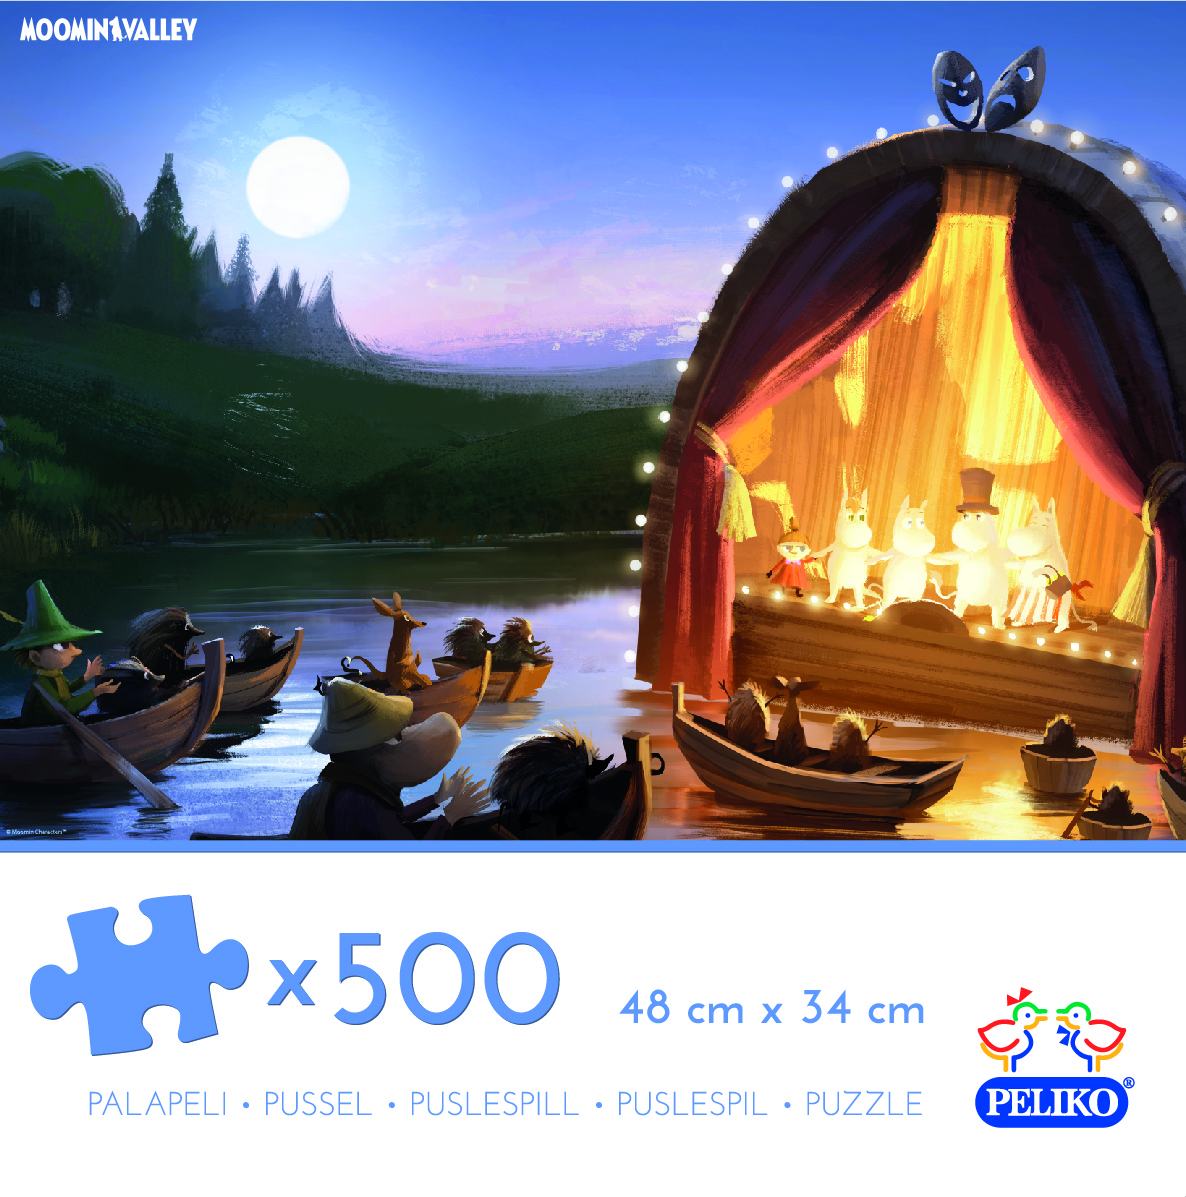 Martinex Moominvalley Jigzaw Puzzle 500 Pieces